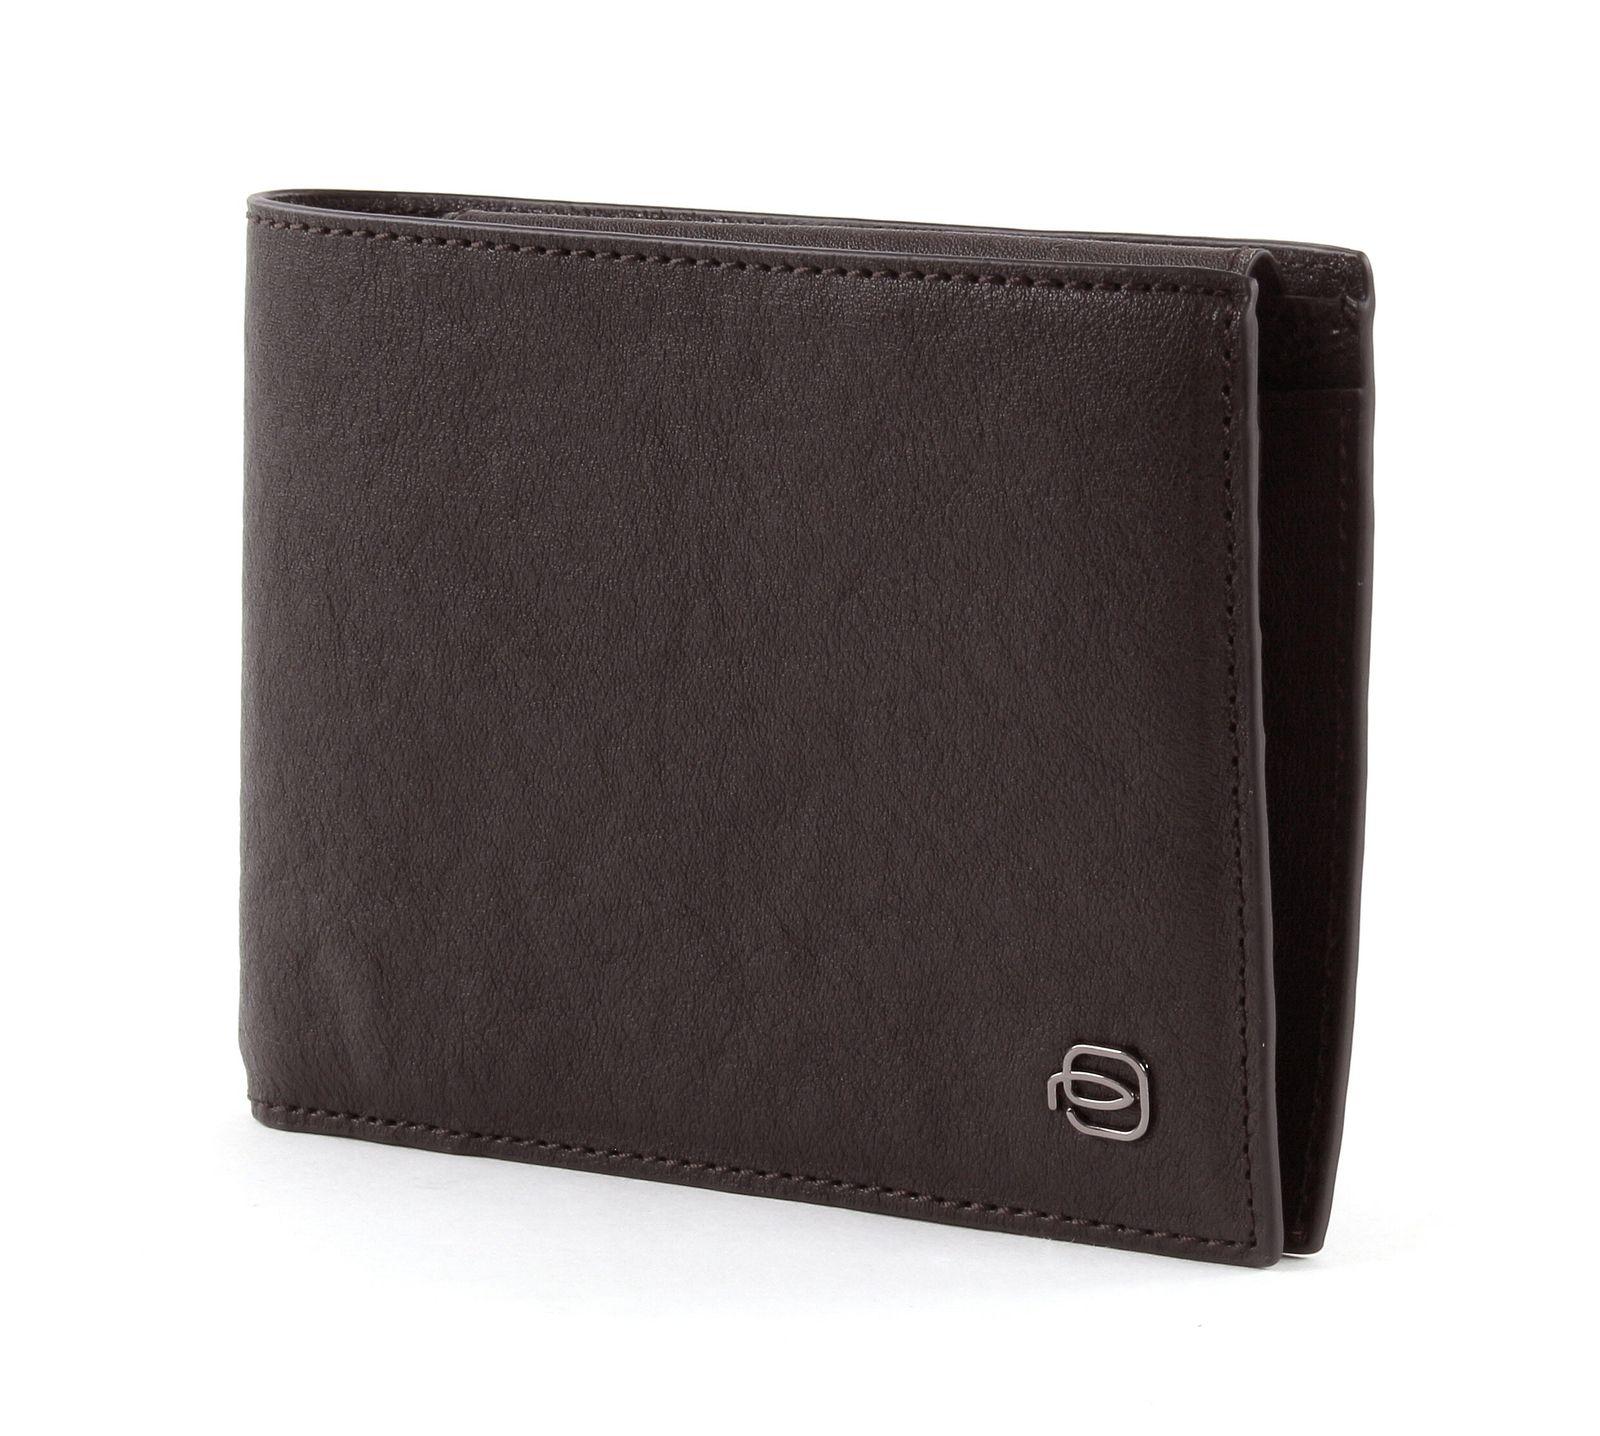 PIQUADRO Black Square Slim Wallet Horizontal Marron